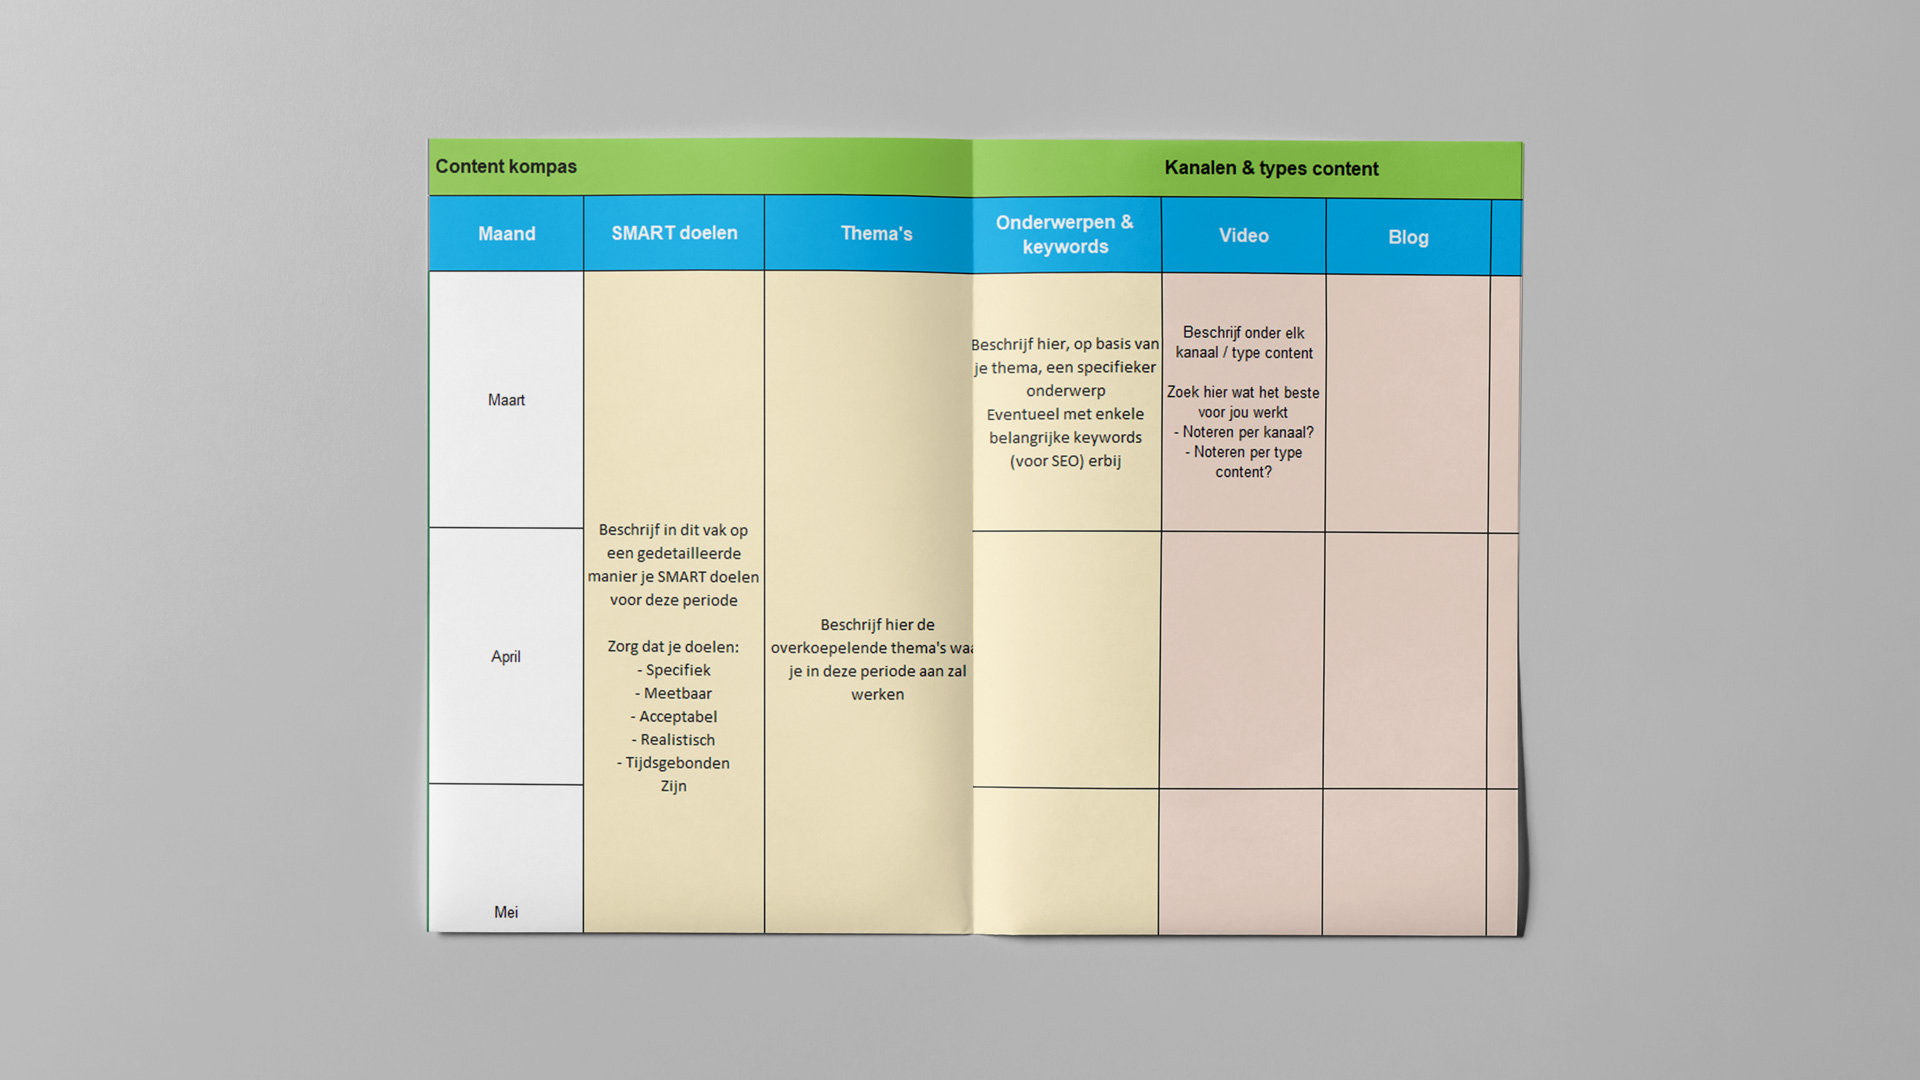 Content-kompas-poster-template Downloads